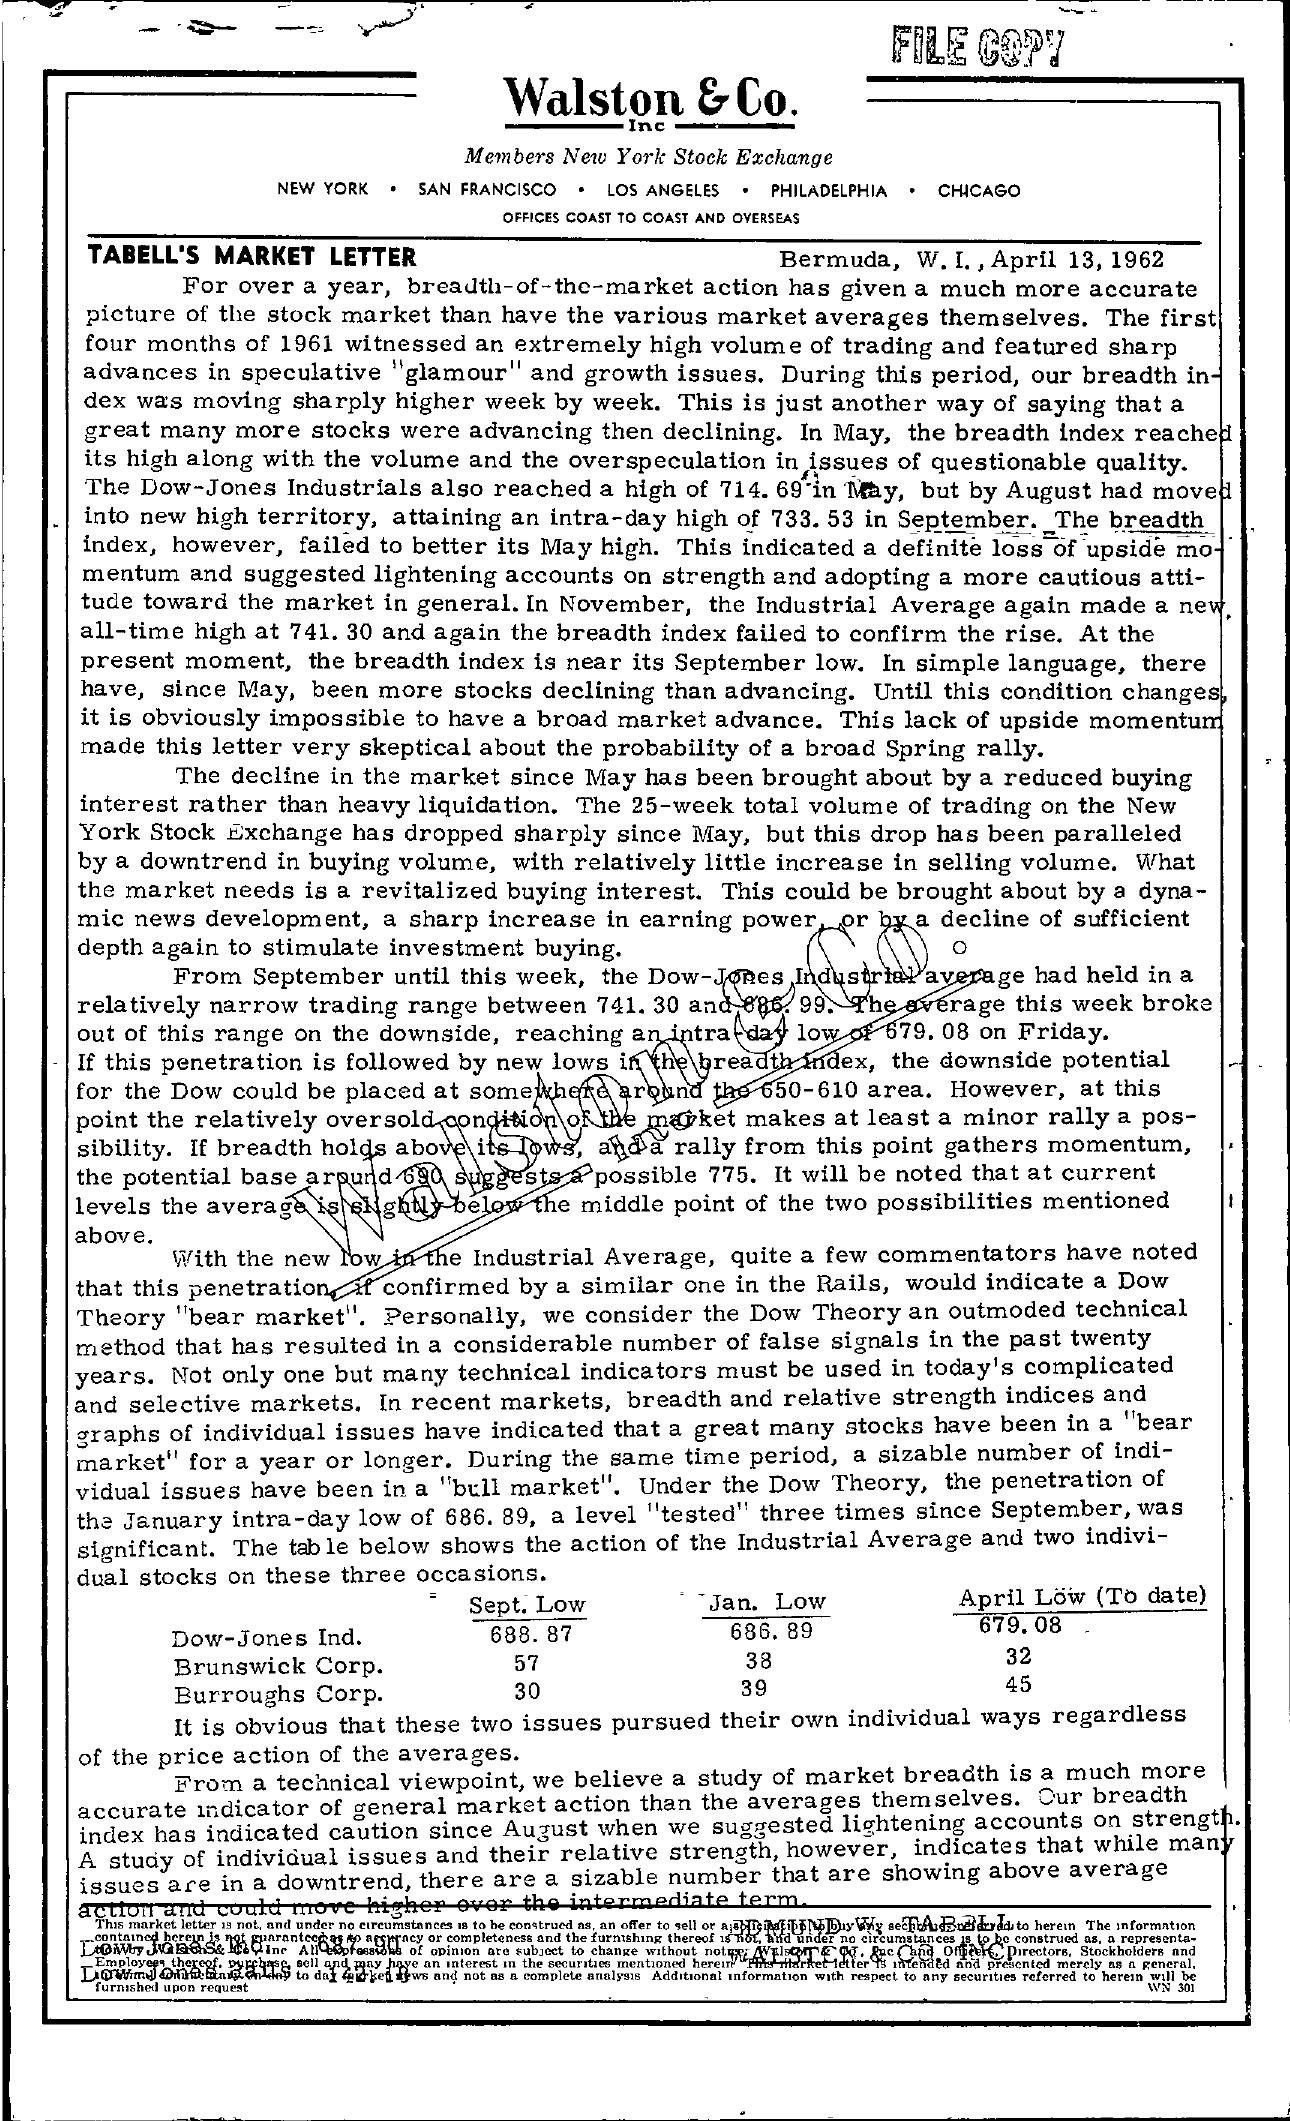 Tabell's Market Letter - April 13, 1962